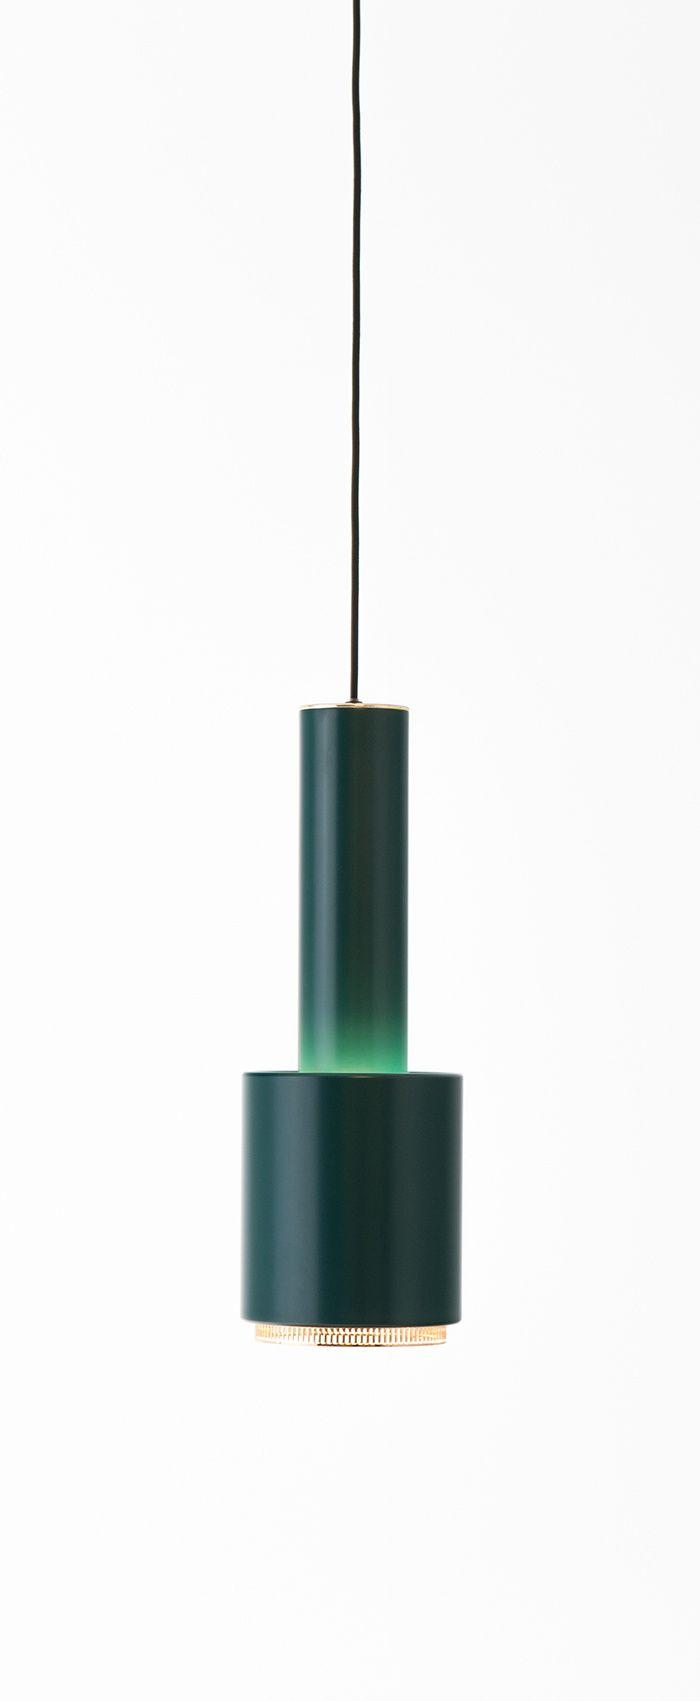 Lighting design Suspension, Alvar Aalto (Artek)